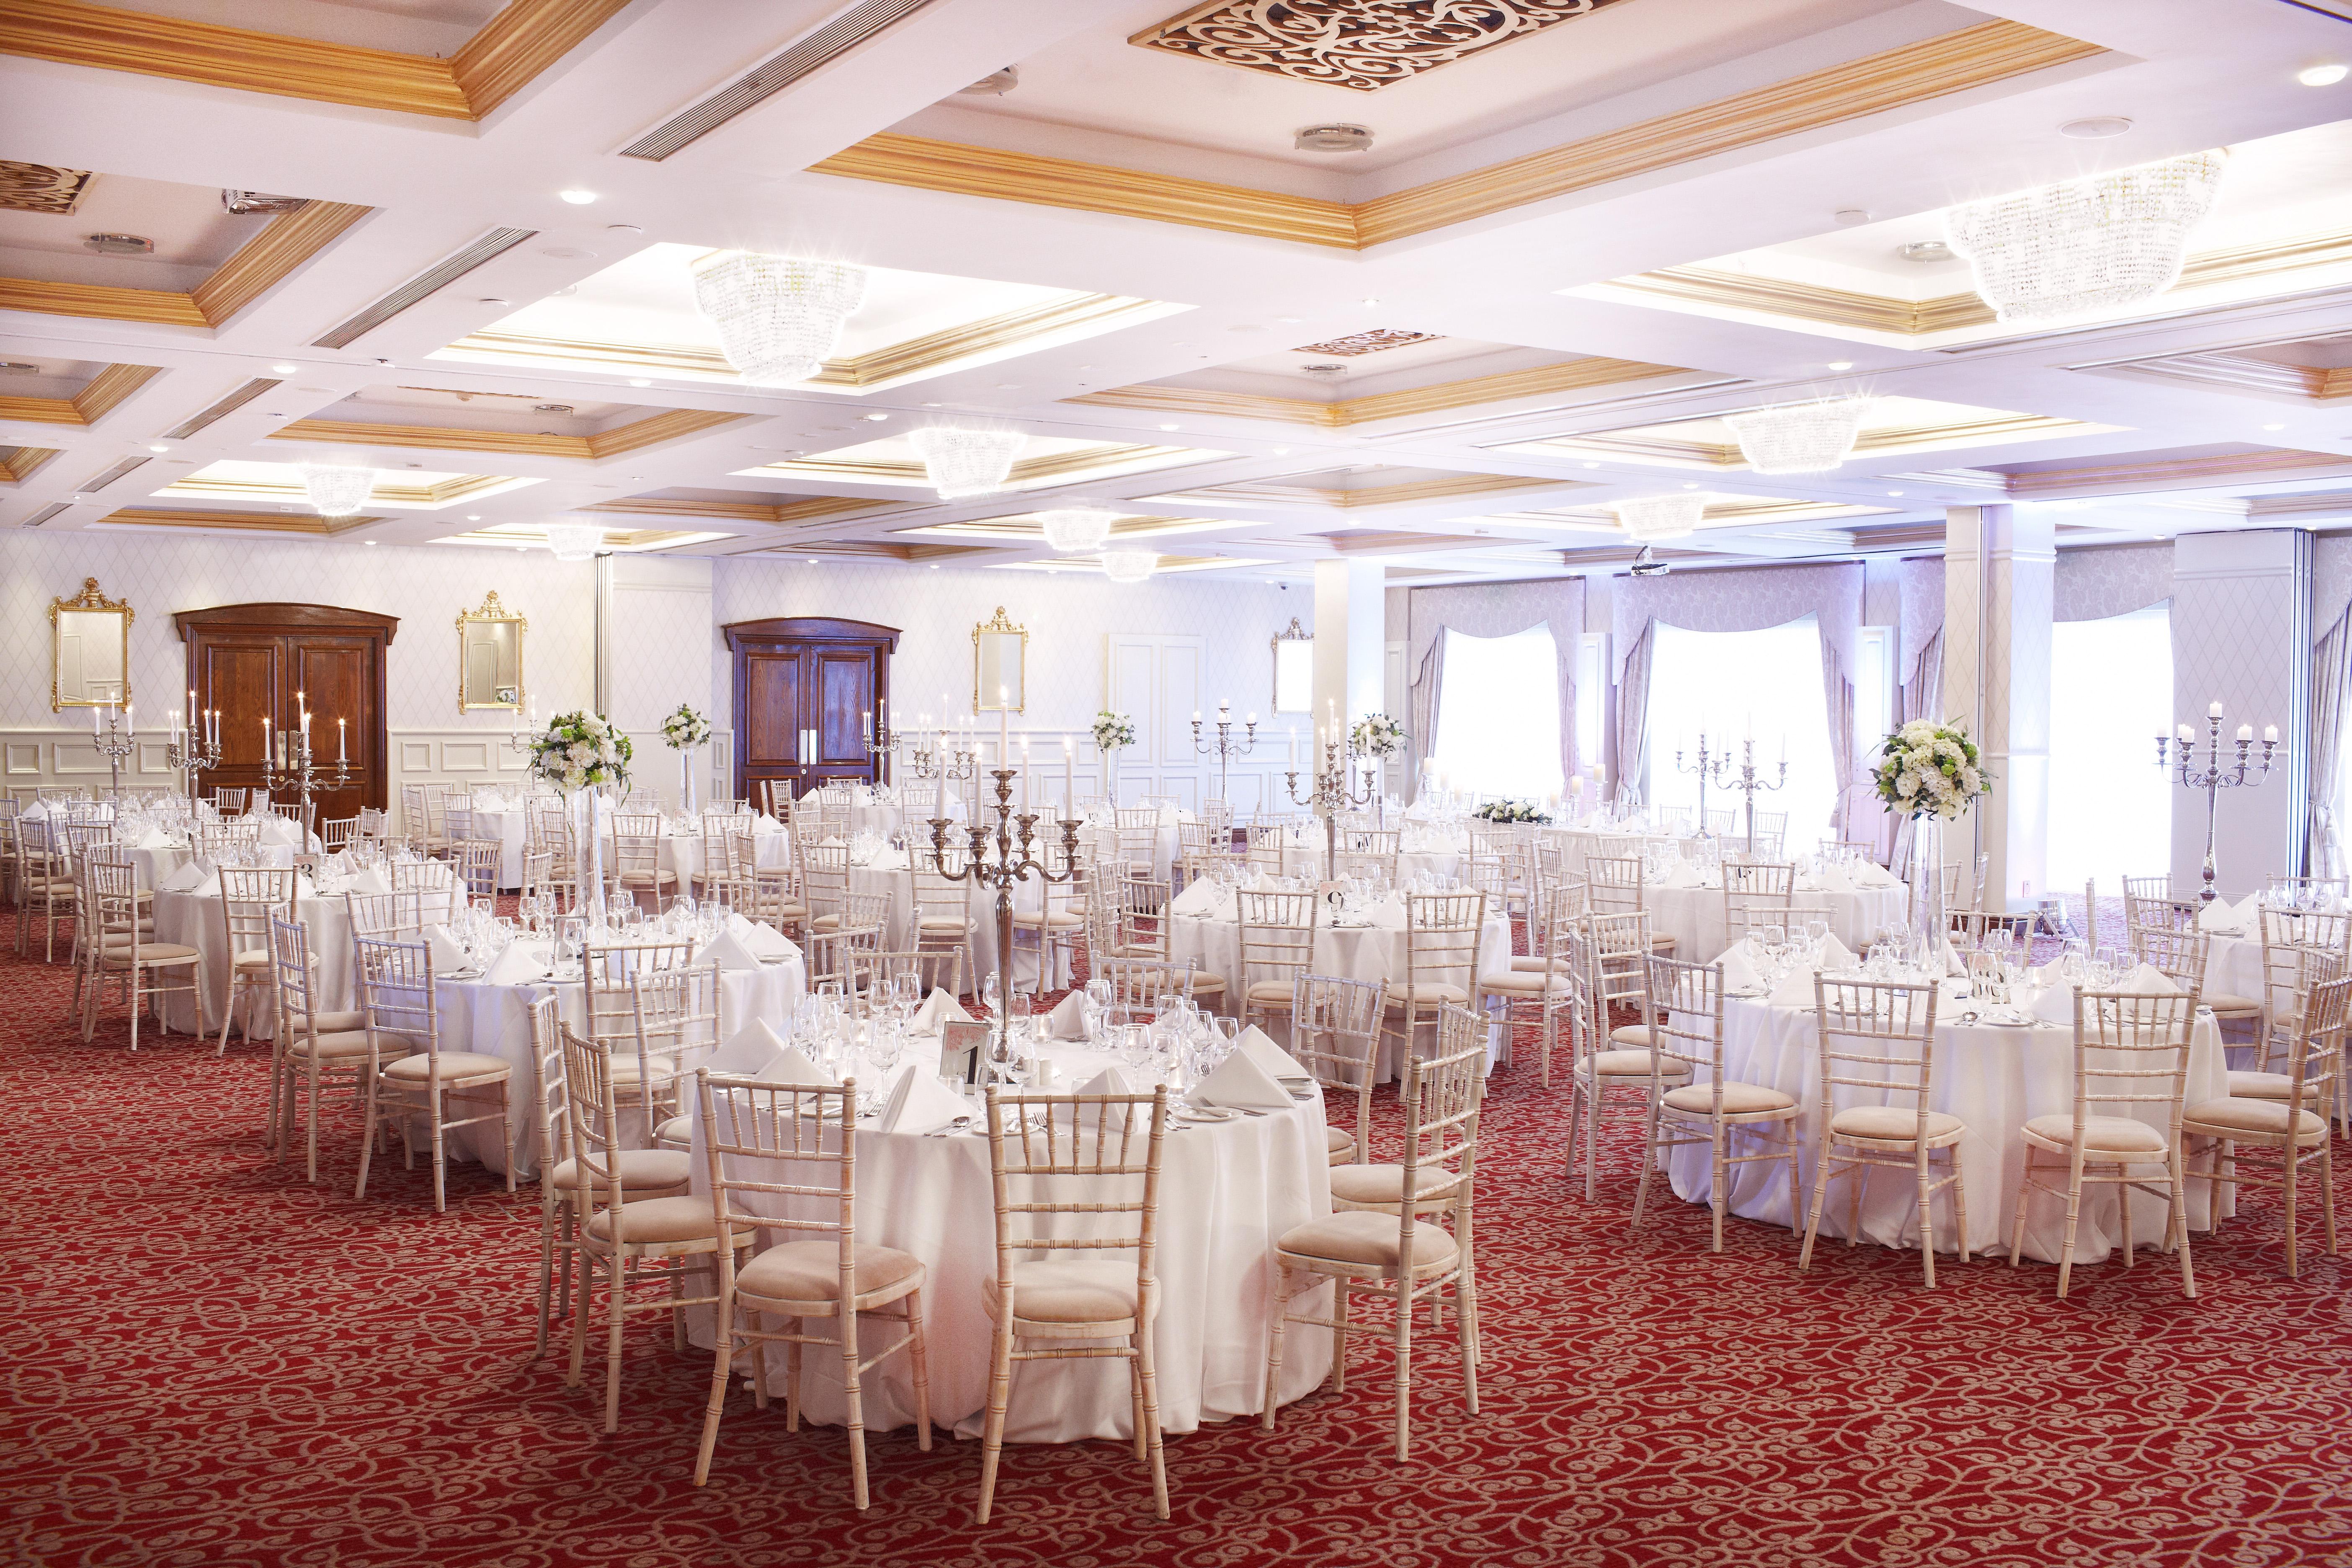 weddingsonline awards 2015 - moran hotels ireland, dublin hotels